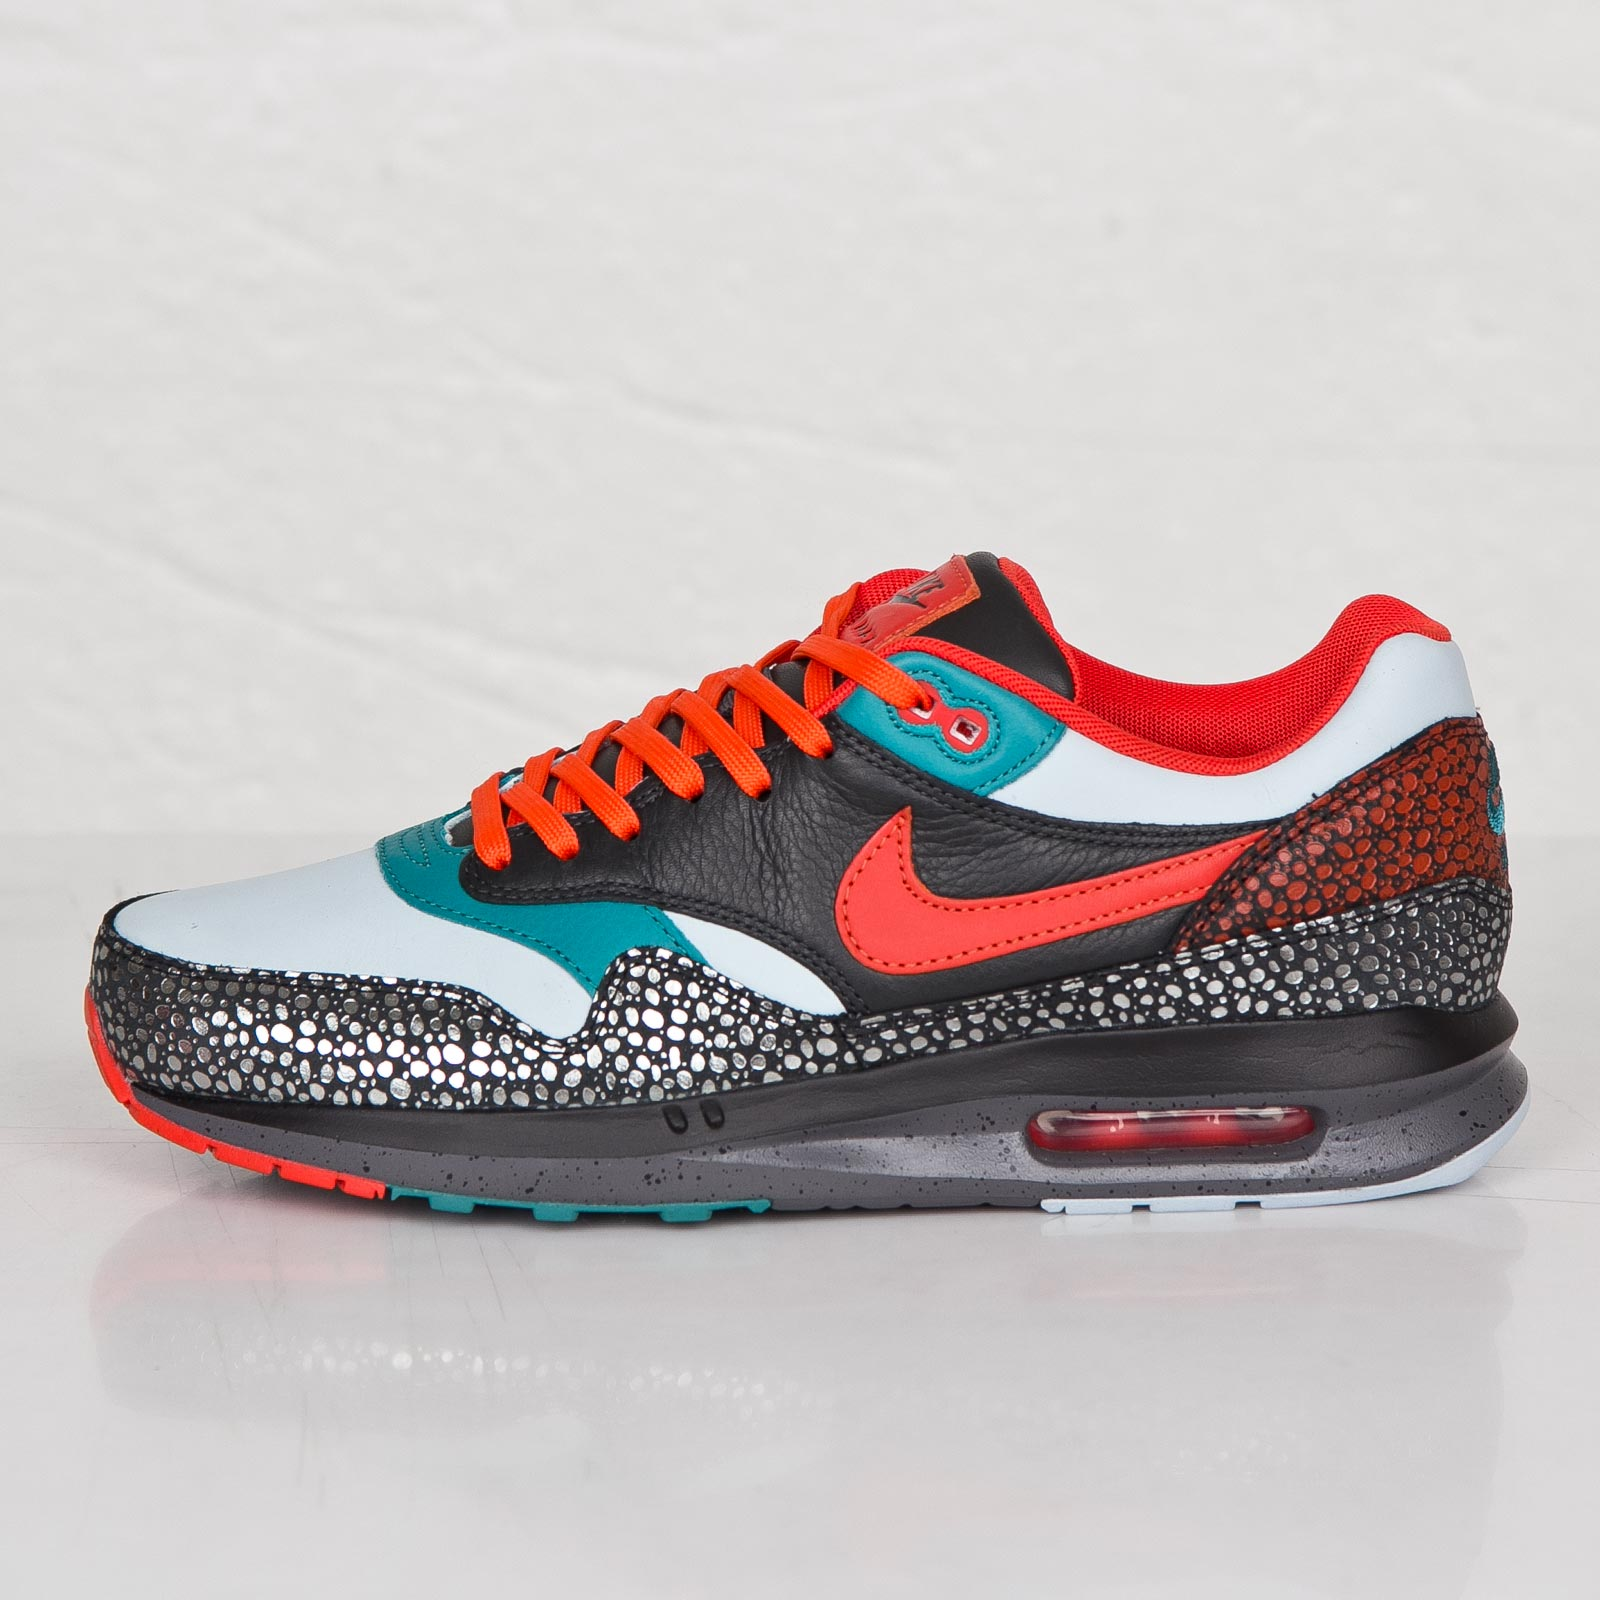 reputable site ce835 c41ff Nike Air Max Lunar1 Deluxe QS - 717598-400 - Sneakersnstuff ...